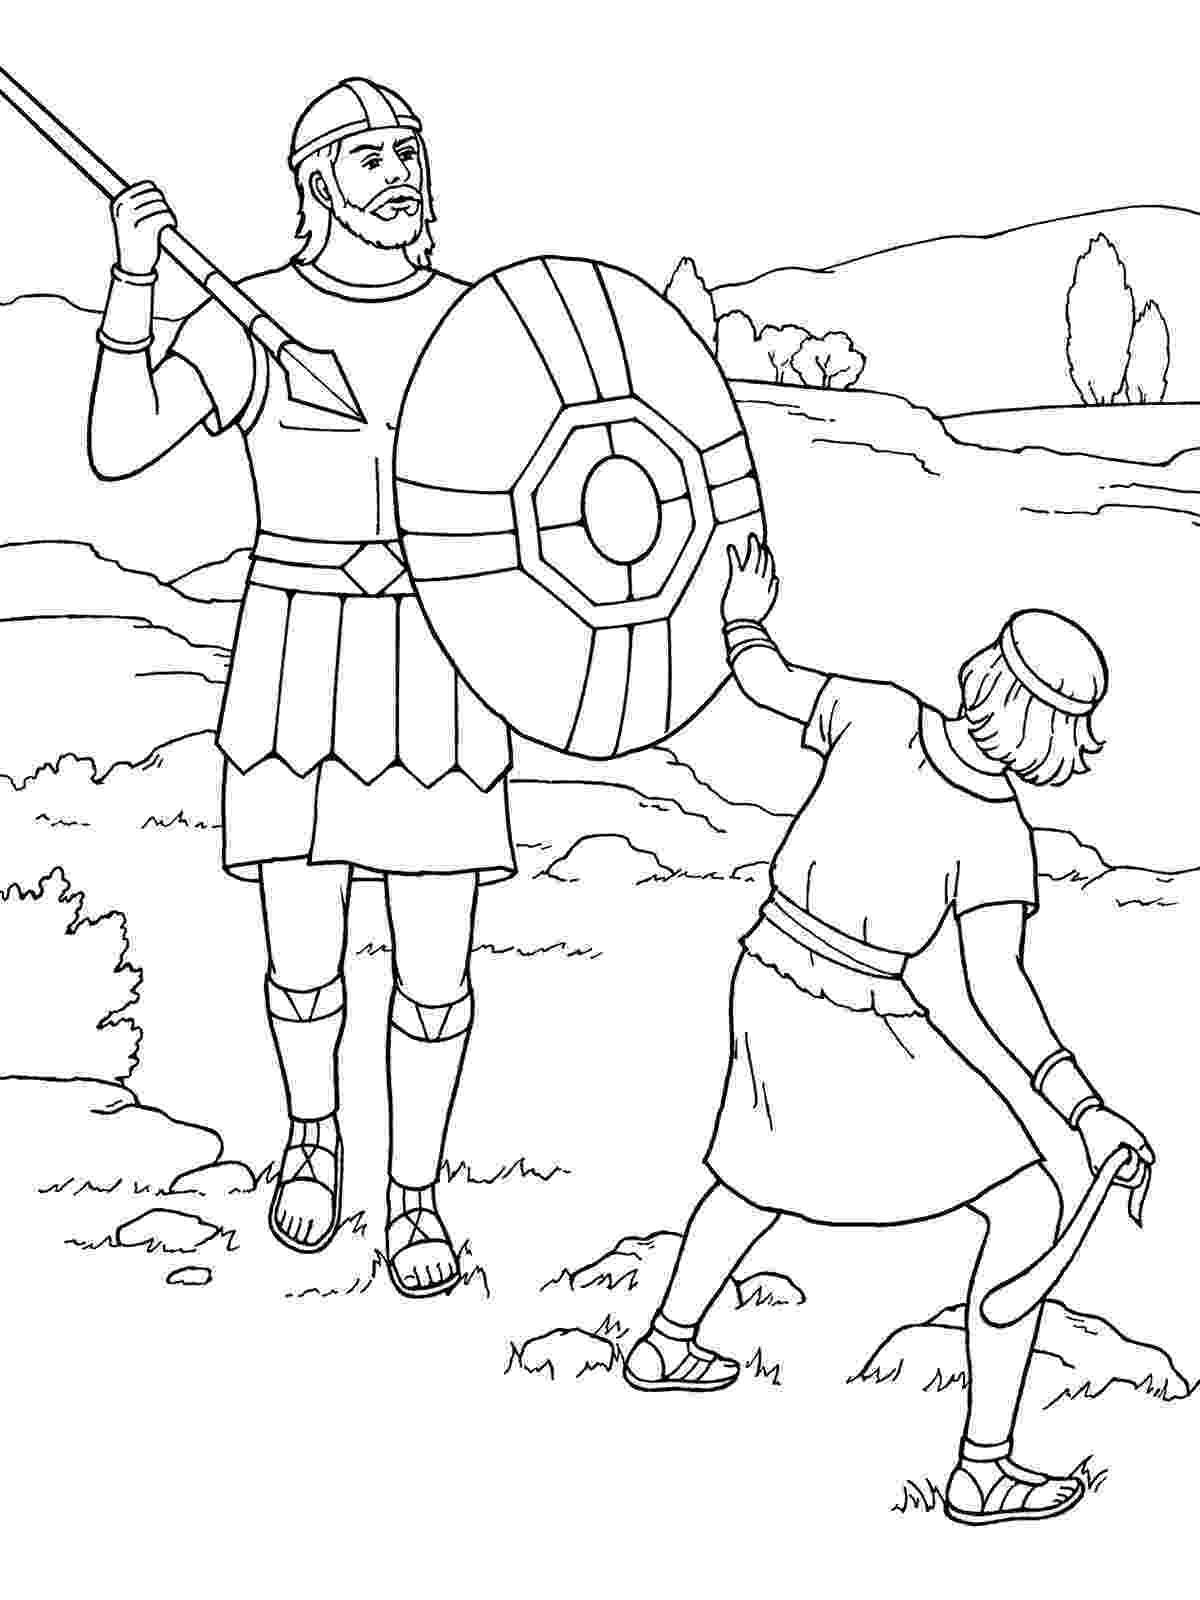 david coloring page top 25 39david and goliath39 coloring pages for your little ones coloring david page